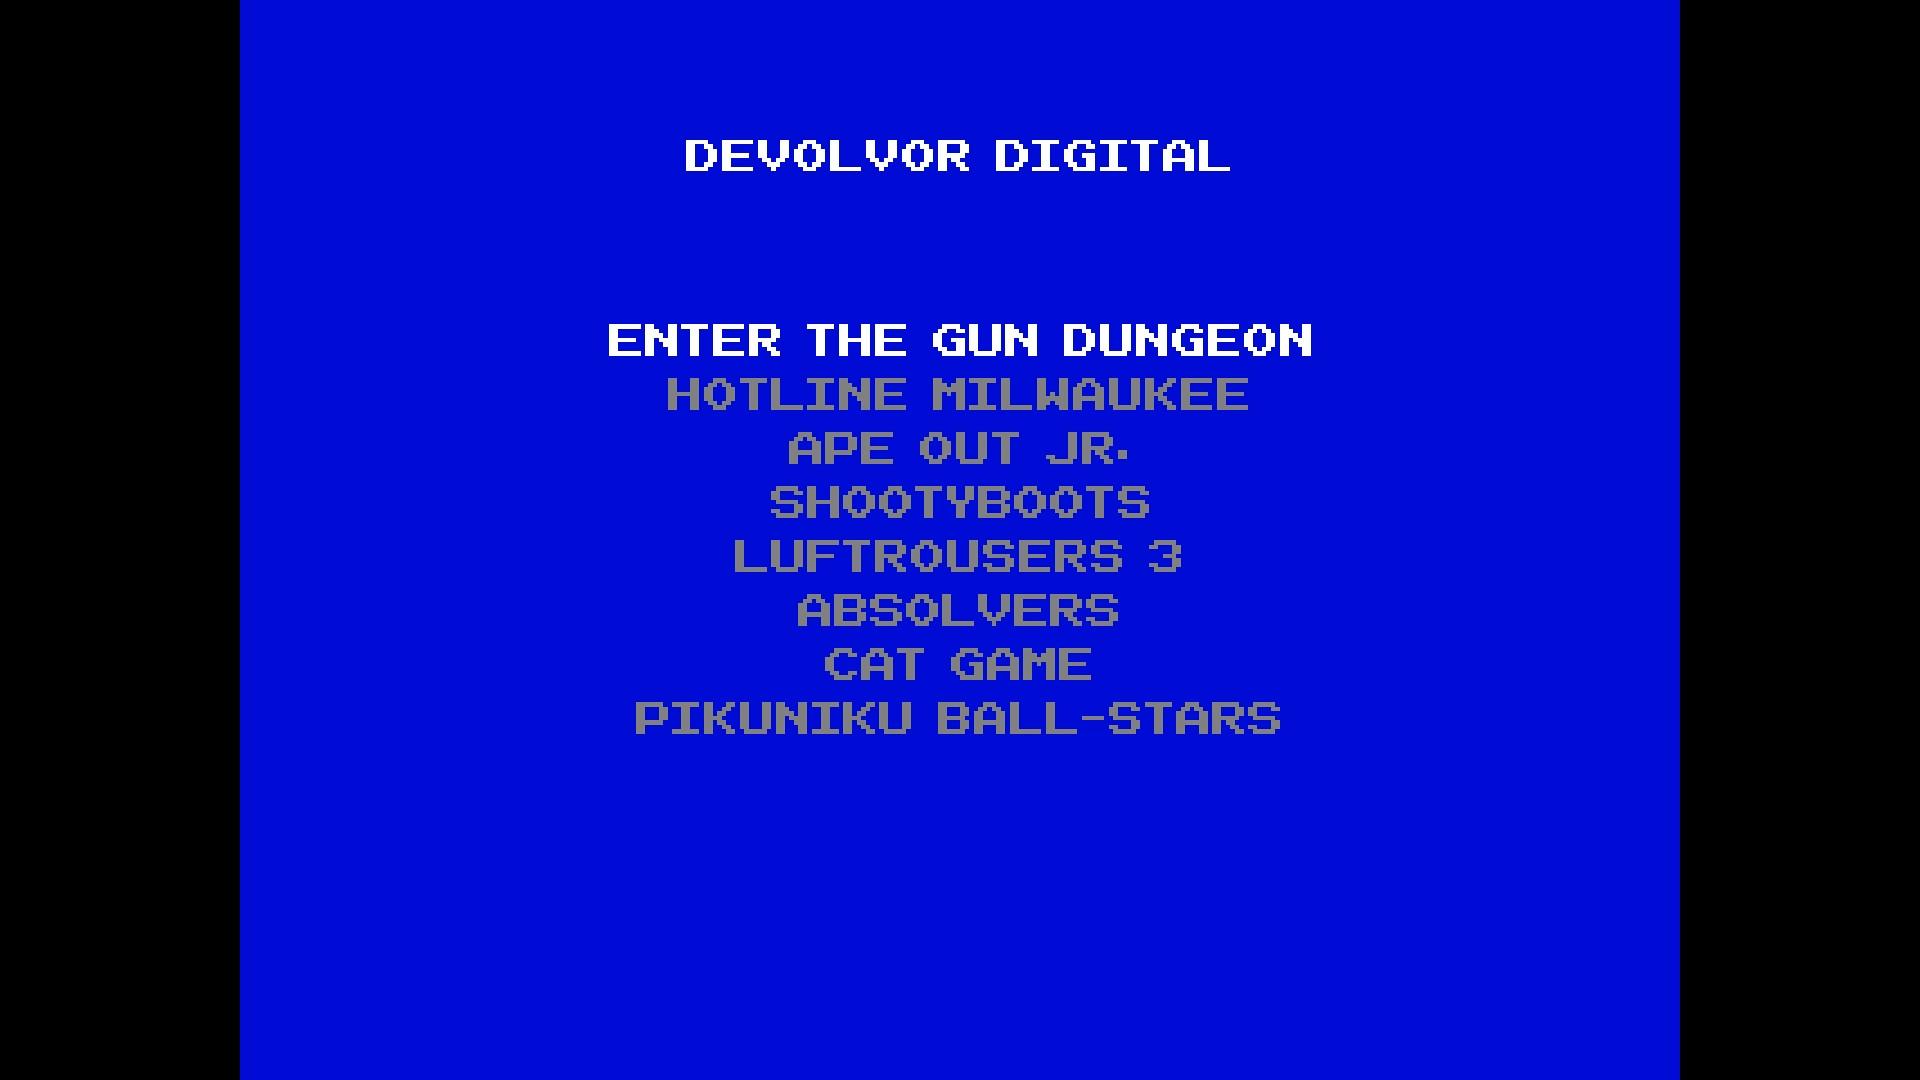 Find the best laptop for Devolver Bootleg